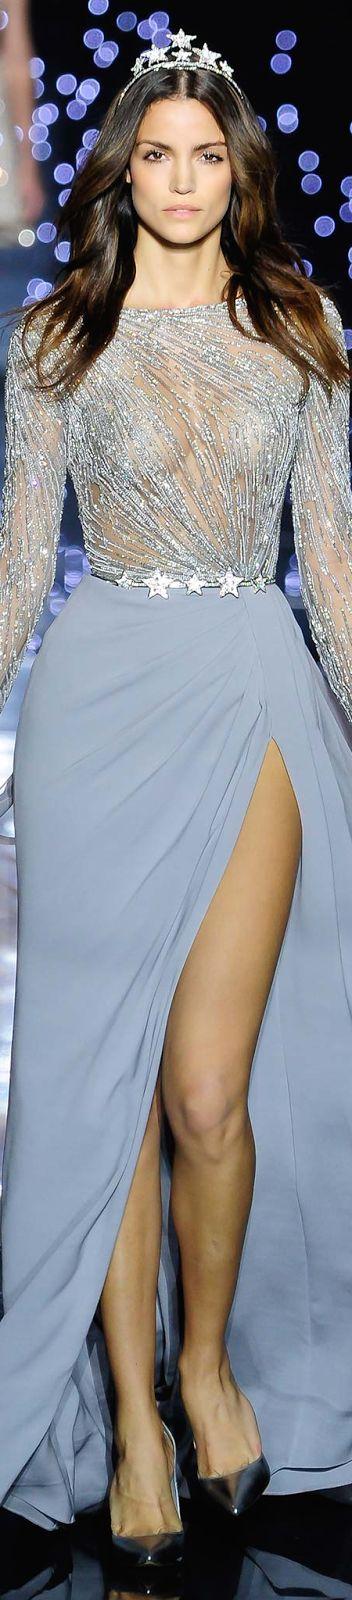 Zuhair Murad ~ Sheer Silvery Blue Gown w deep from slit Fall 2015